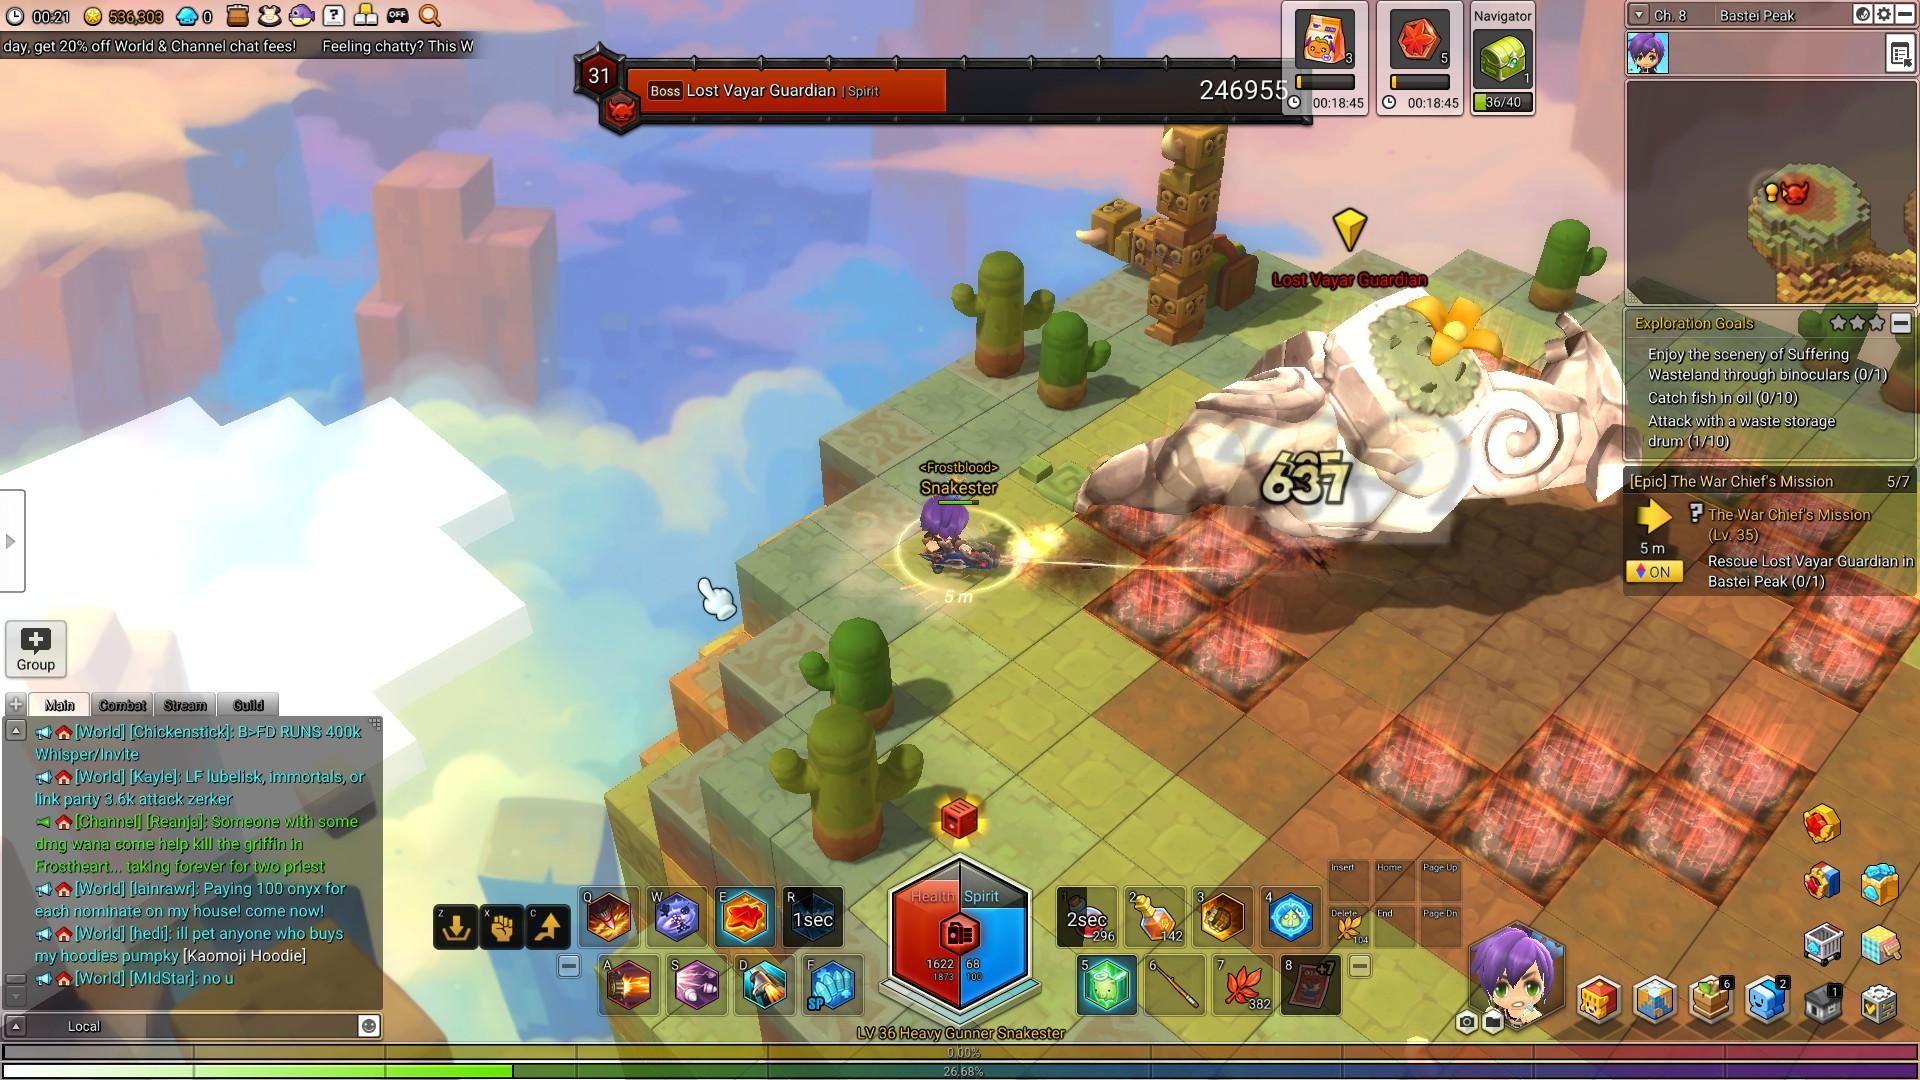 Next MapleStory 2 Update Focused on Fairfight & More -